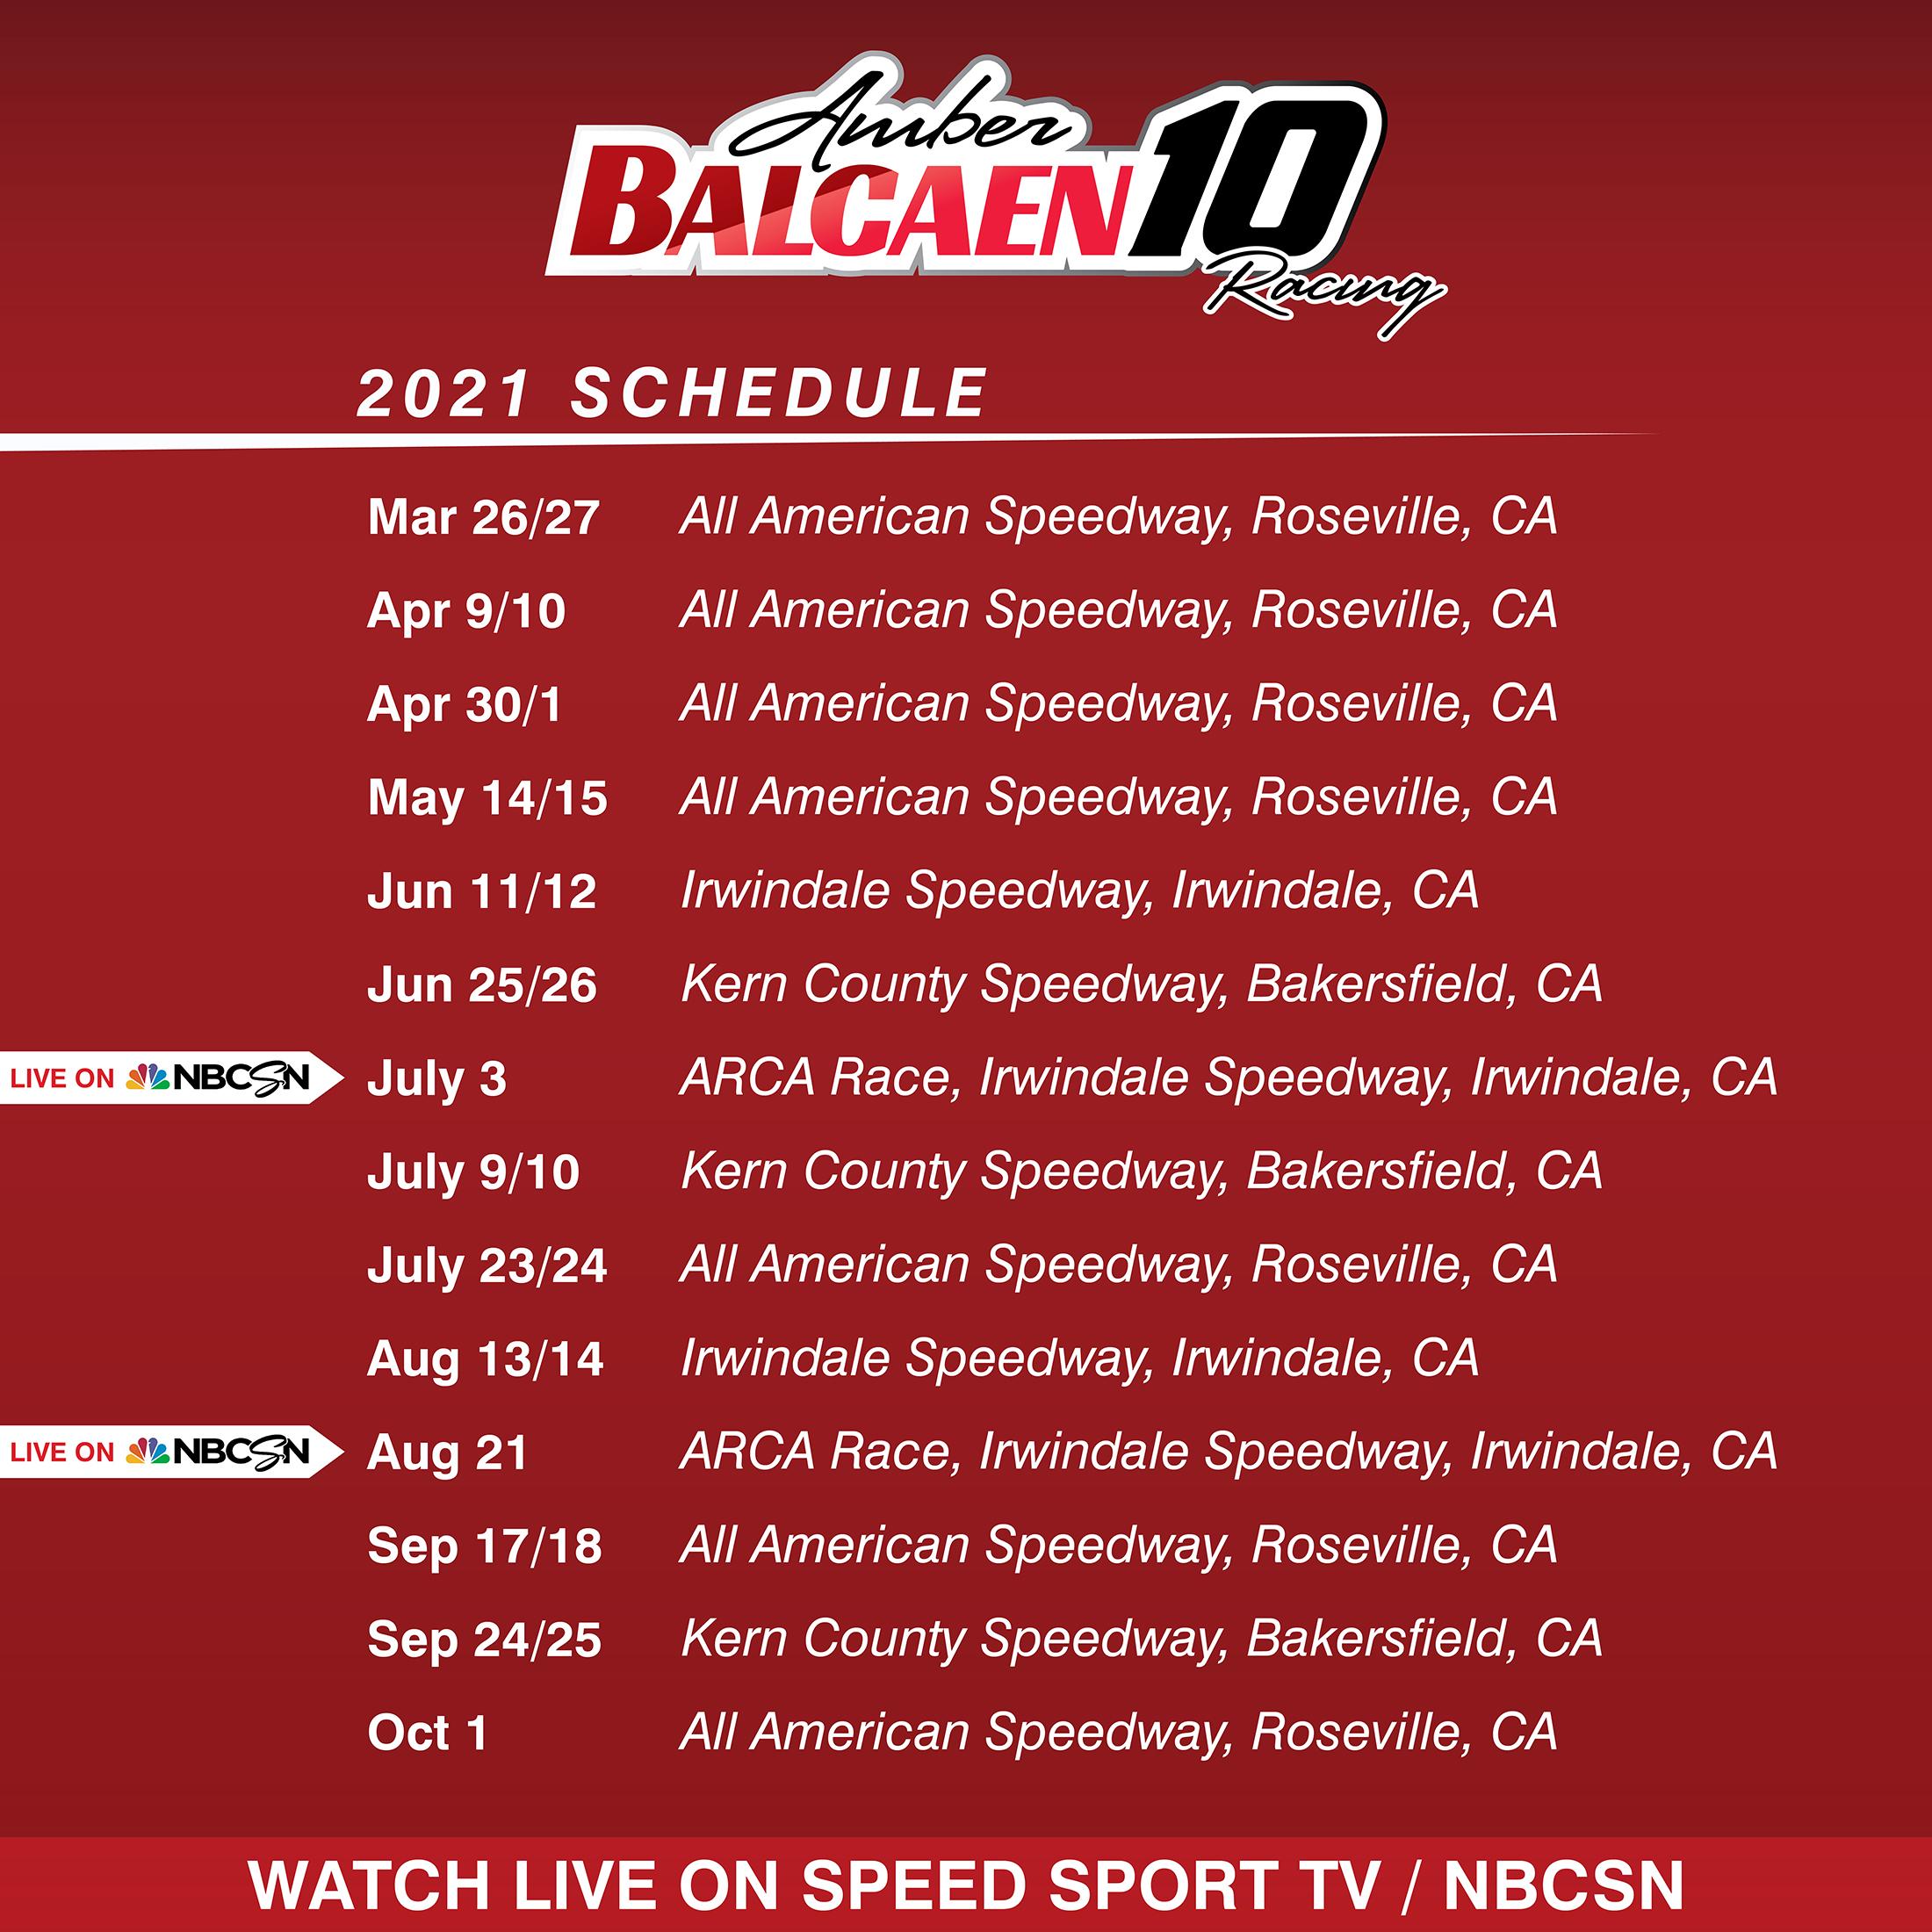 feed-amber-balcaen-nascar-racing-schedule-update-2021-04-14-v2-02.jpg